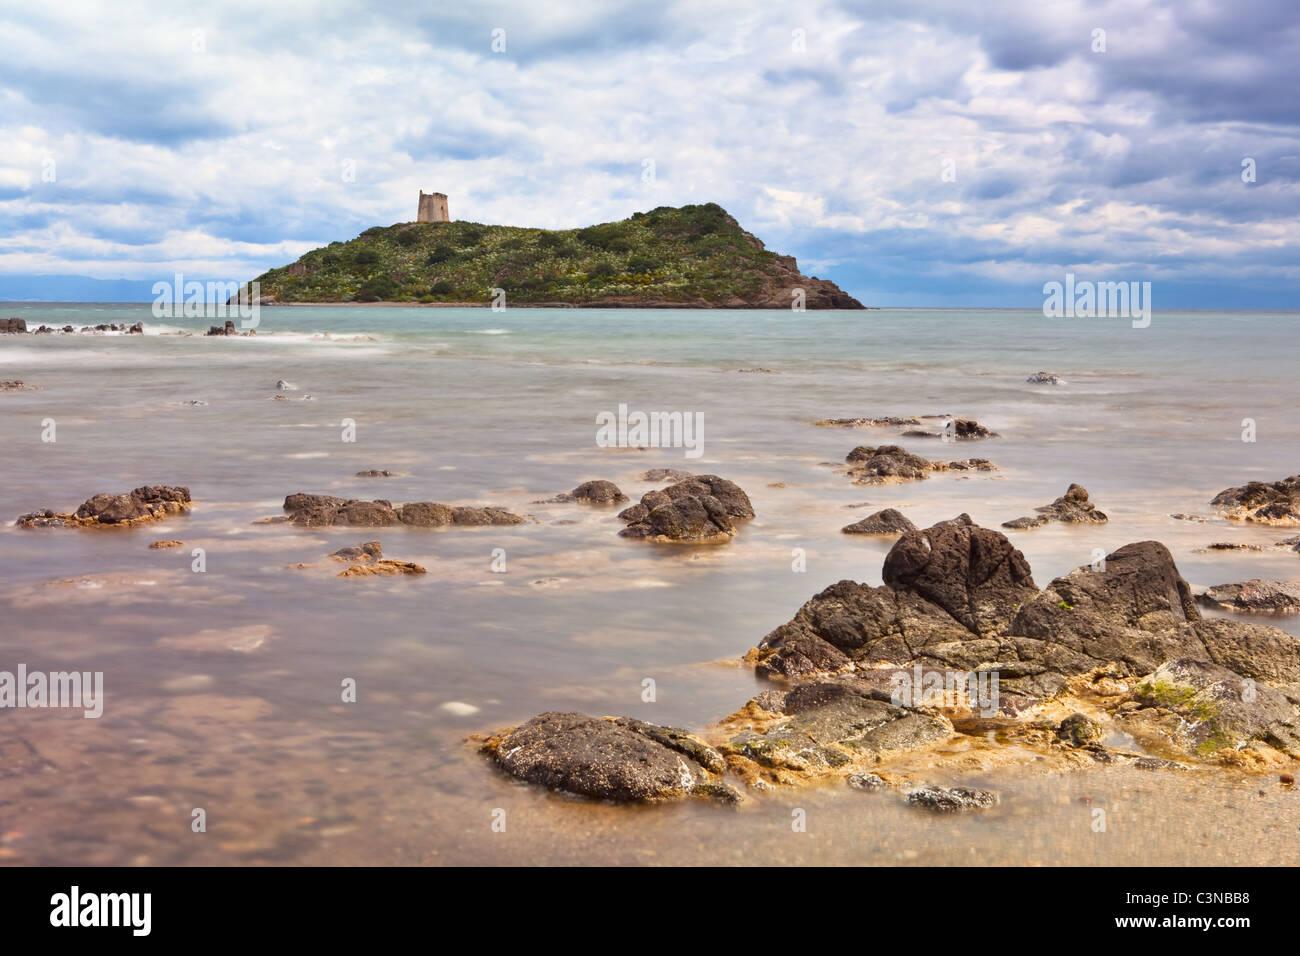 Roman tower on Island Sardinia Italy long exposure milky sea dramatic sky and clouds rocks in surf - Stock Image